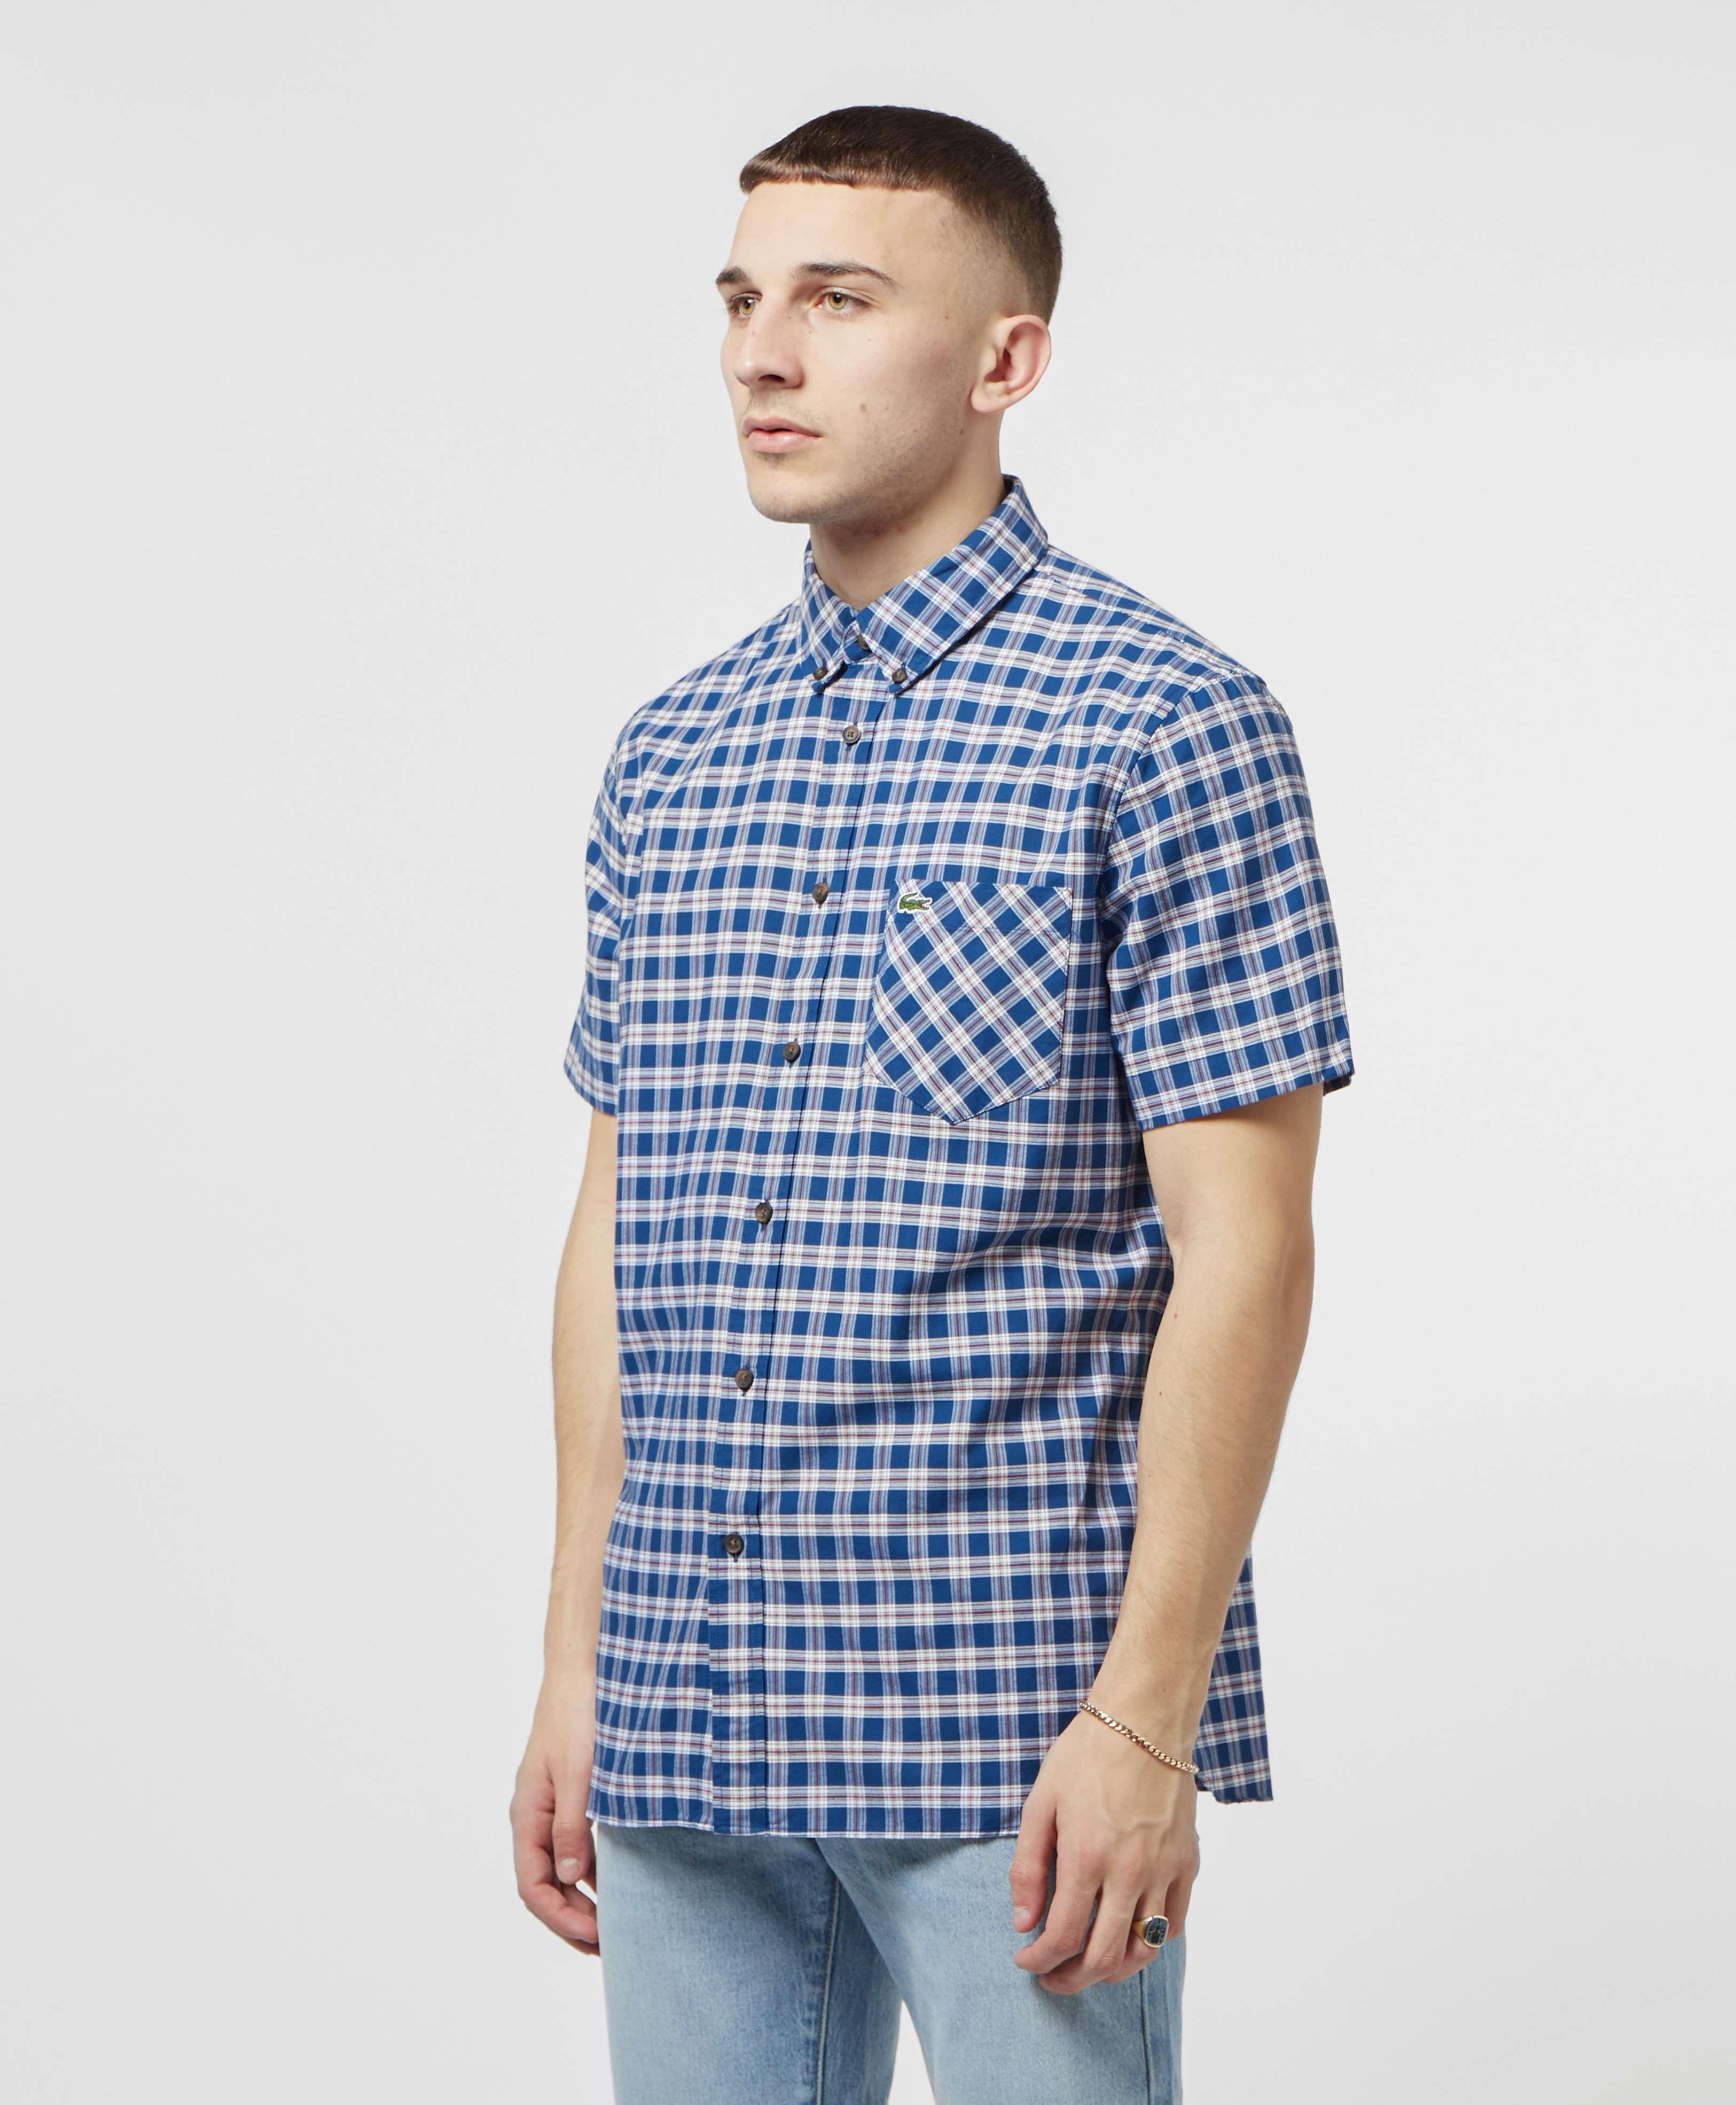 Lacoste Short Sleeve Check Shirt